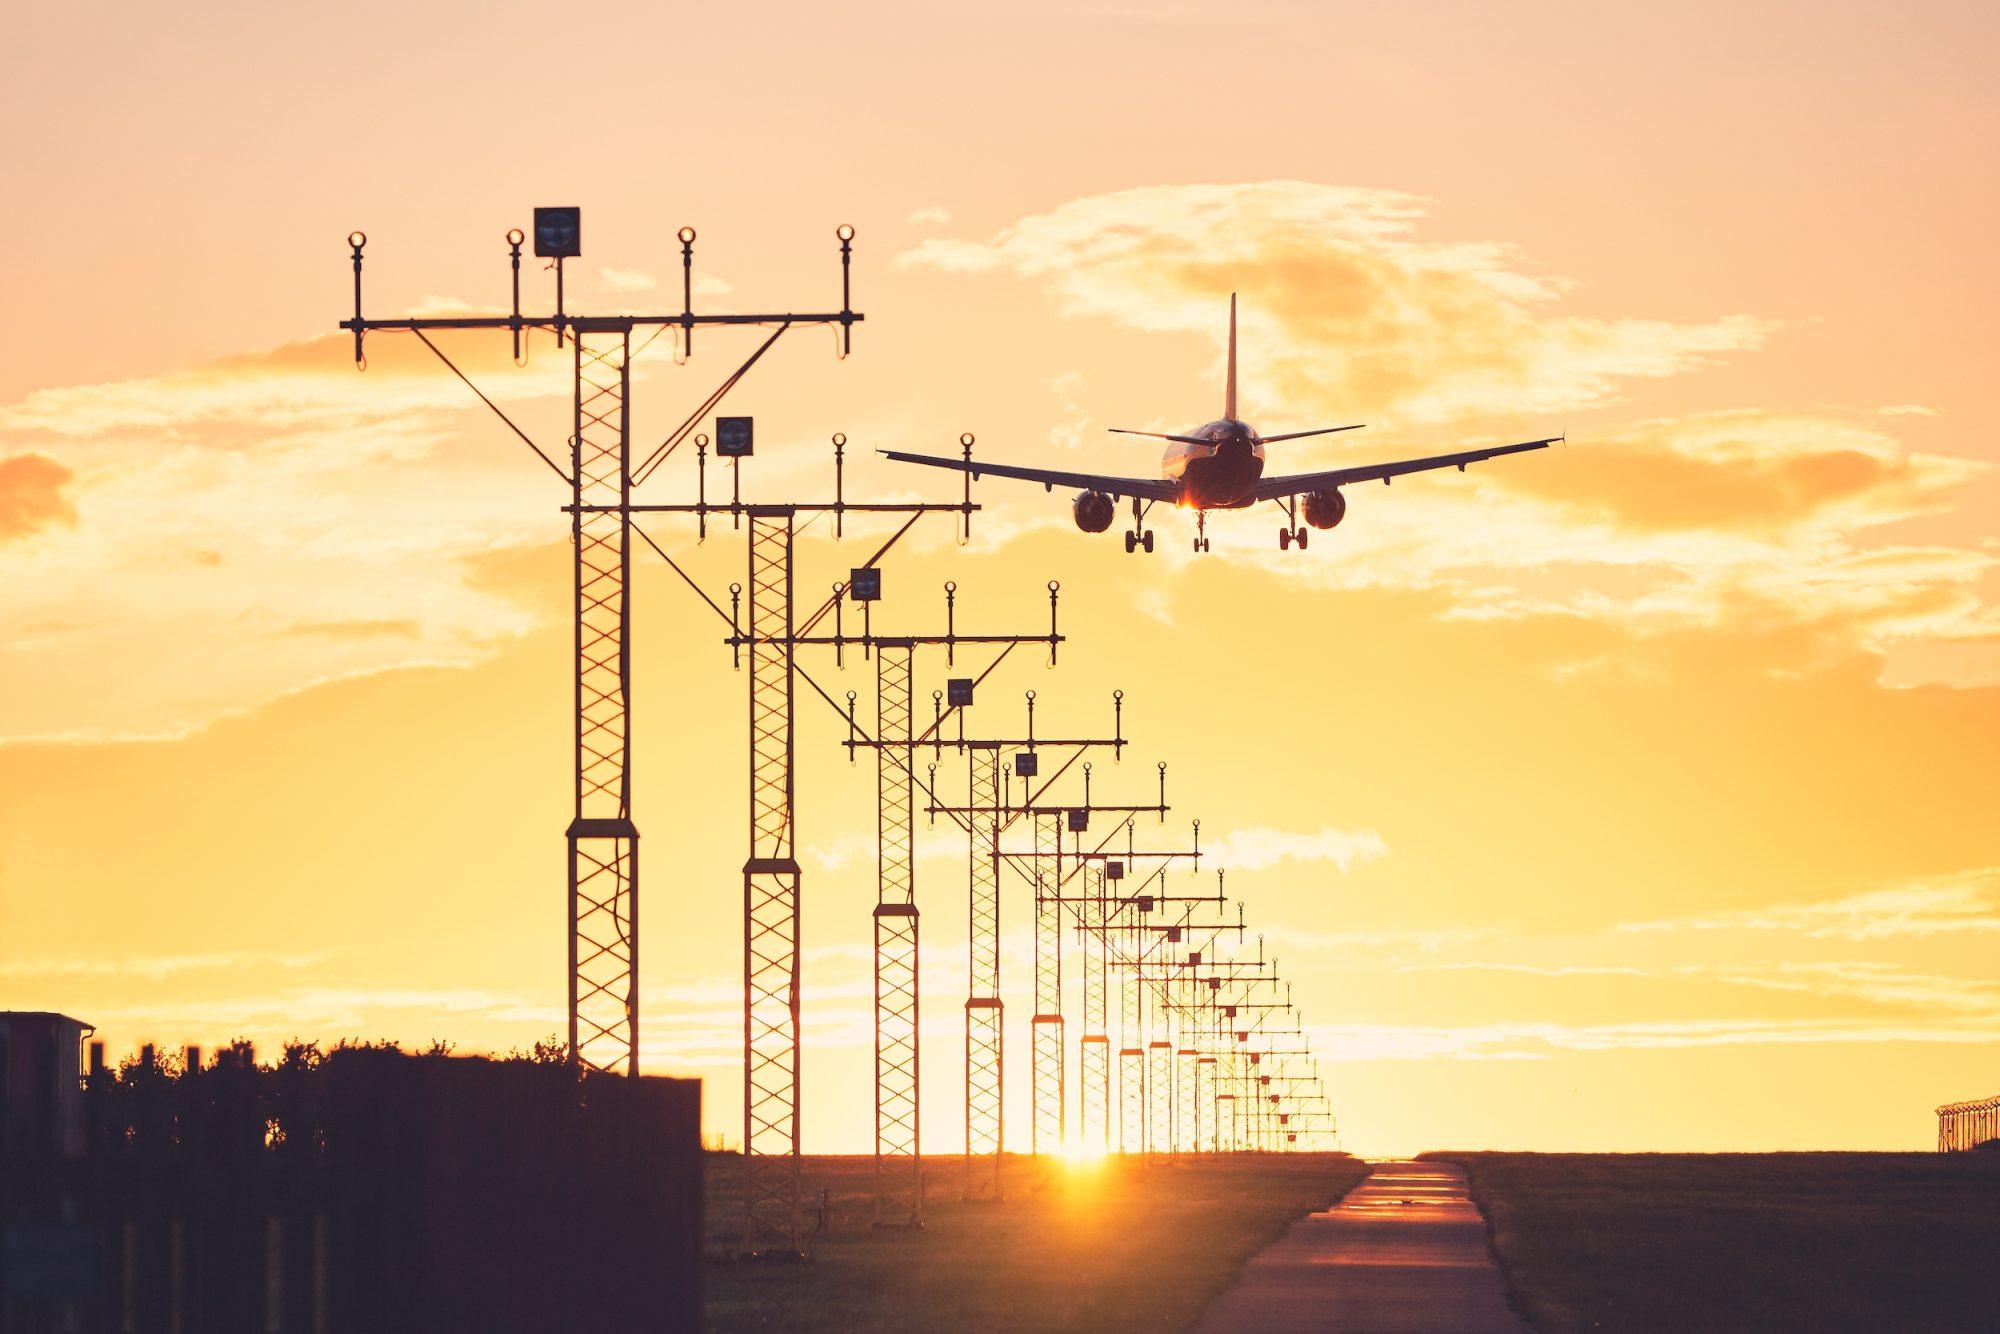 Qatar Airways: emergency landing in a Turkish province to save passenger life